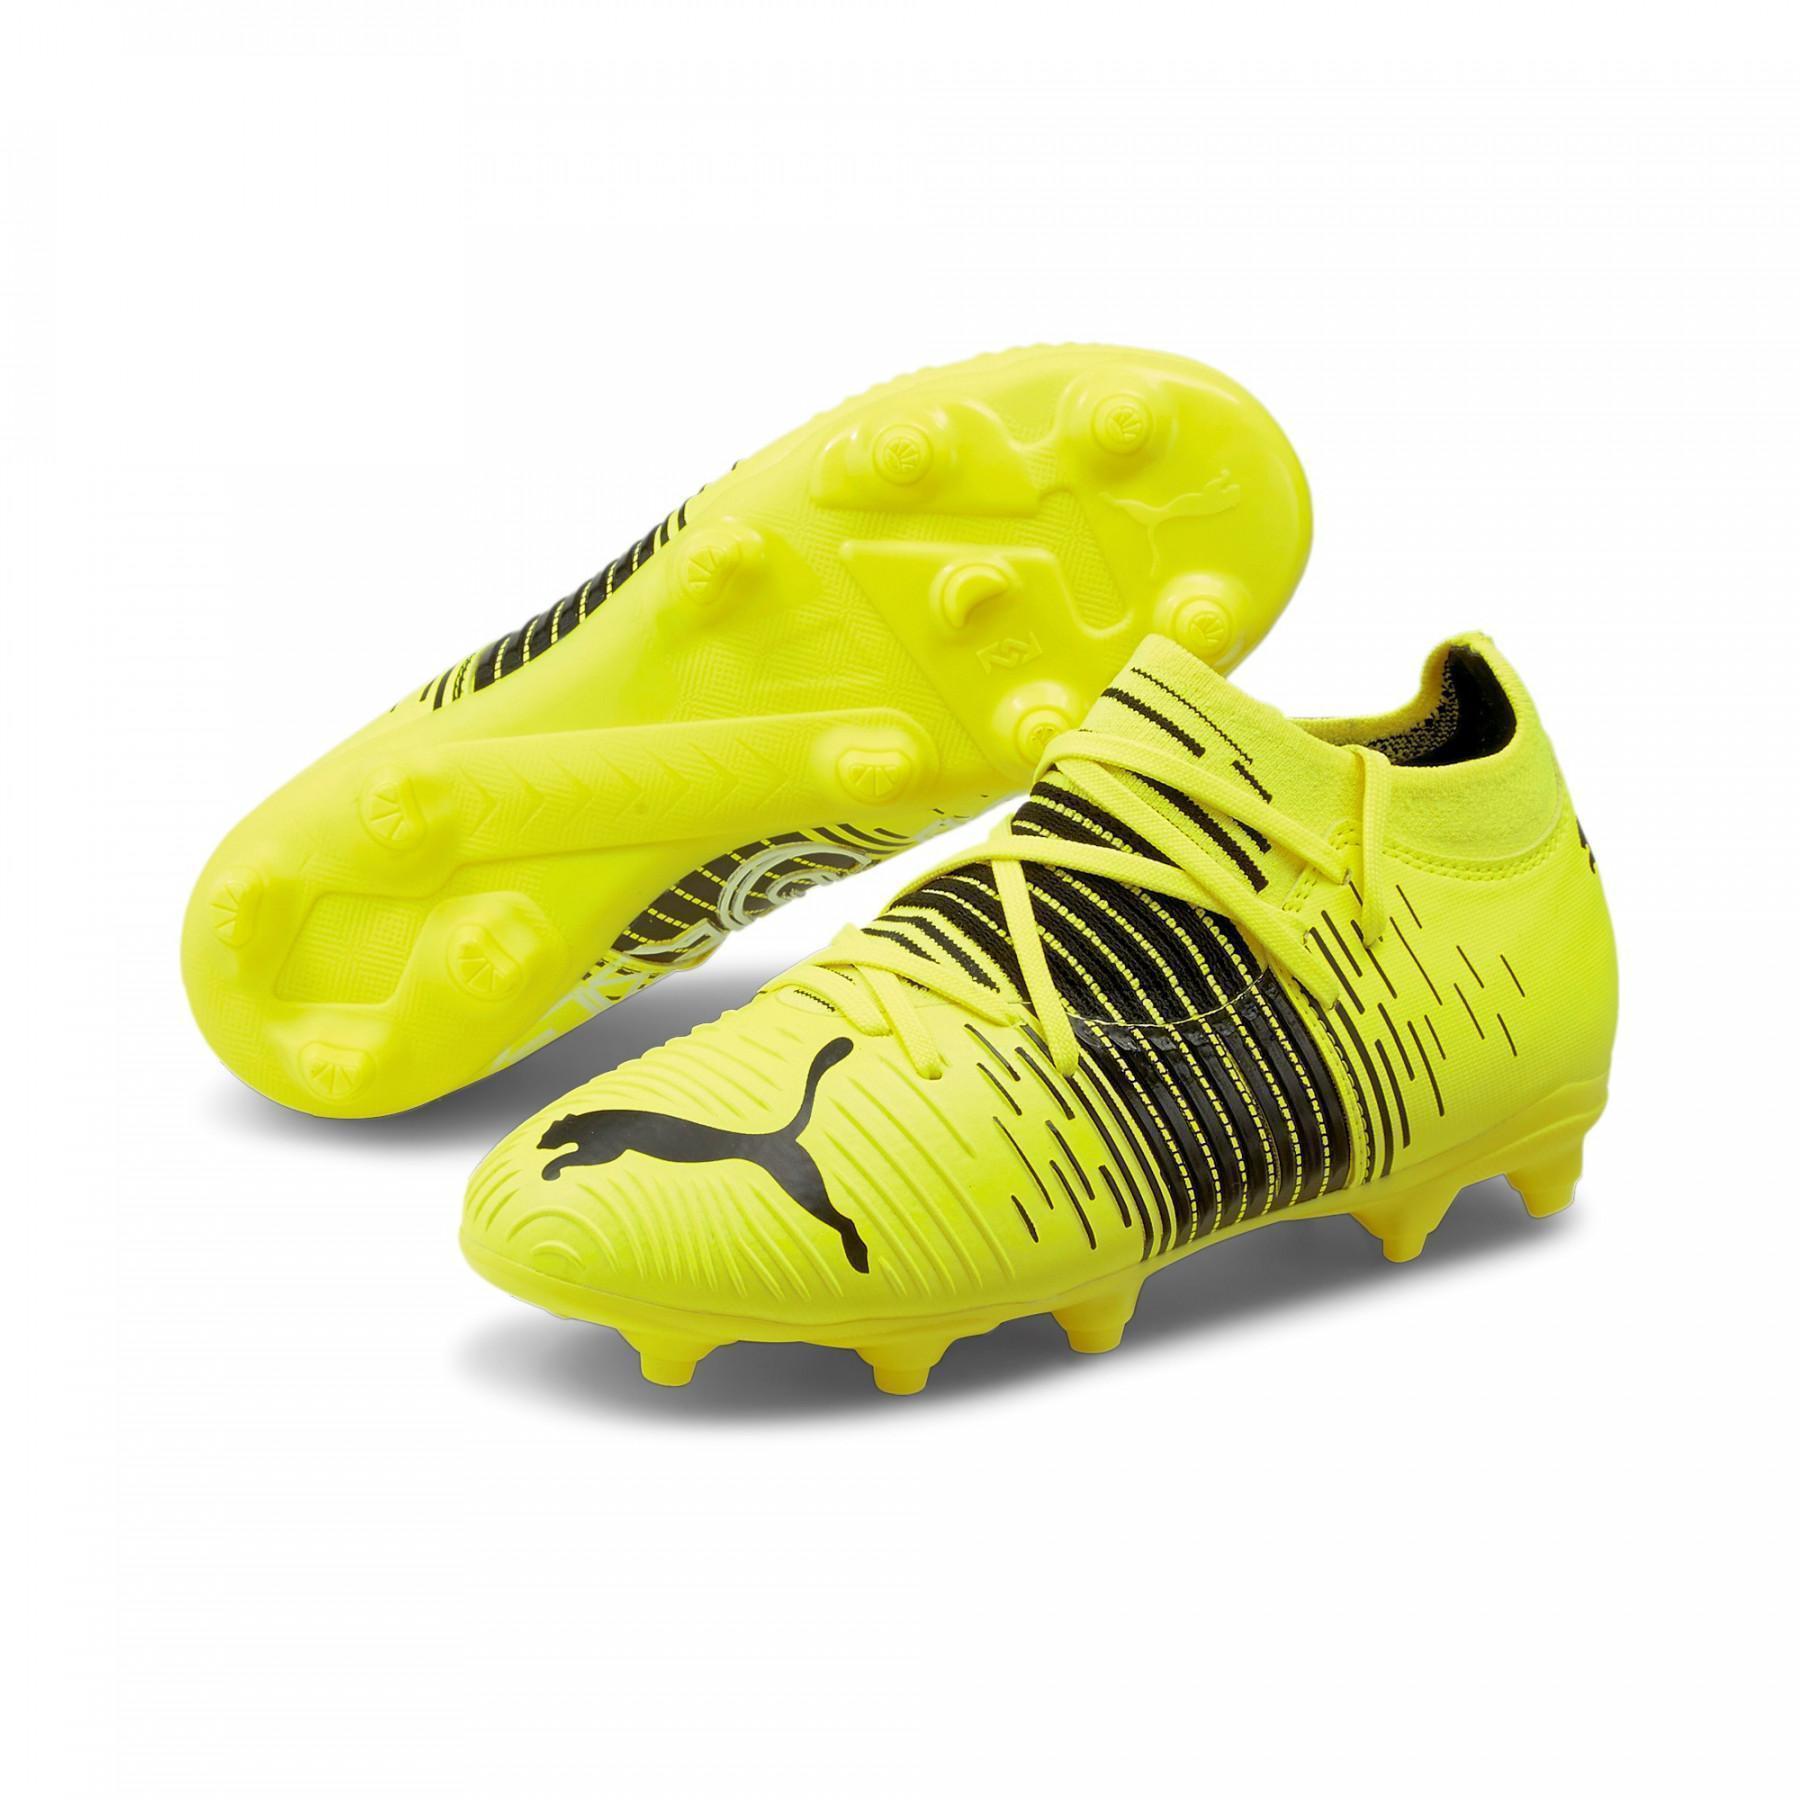 Children's shoes Puma Future Z 3 1 FG/AG